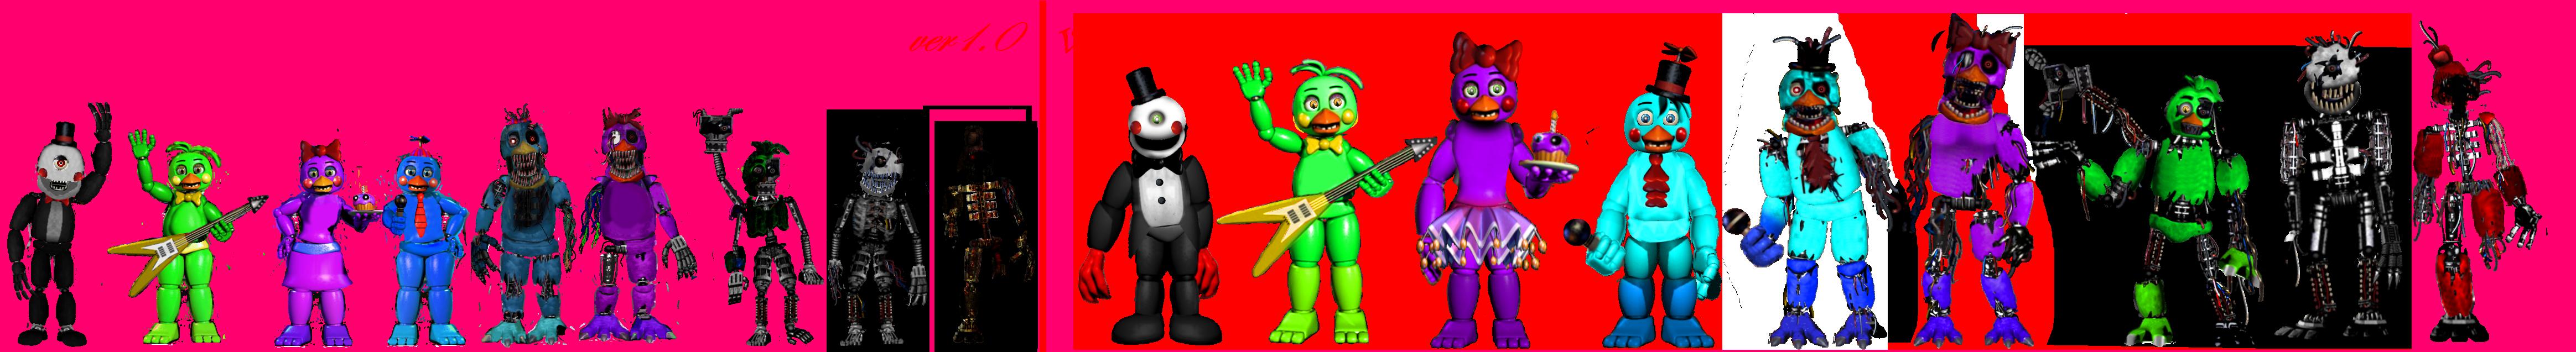 Tnae 3 Upgrade by shadowNightmare13